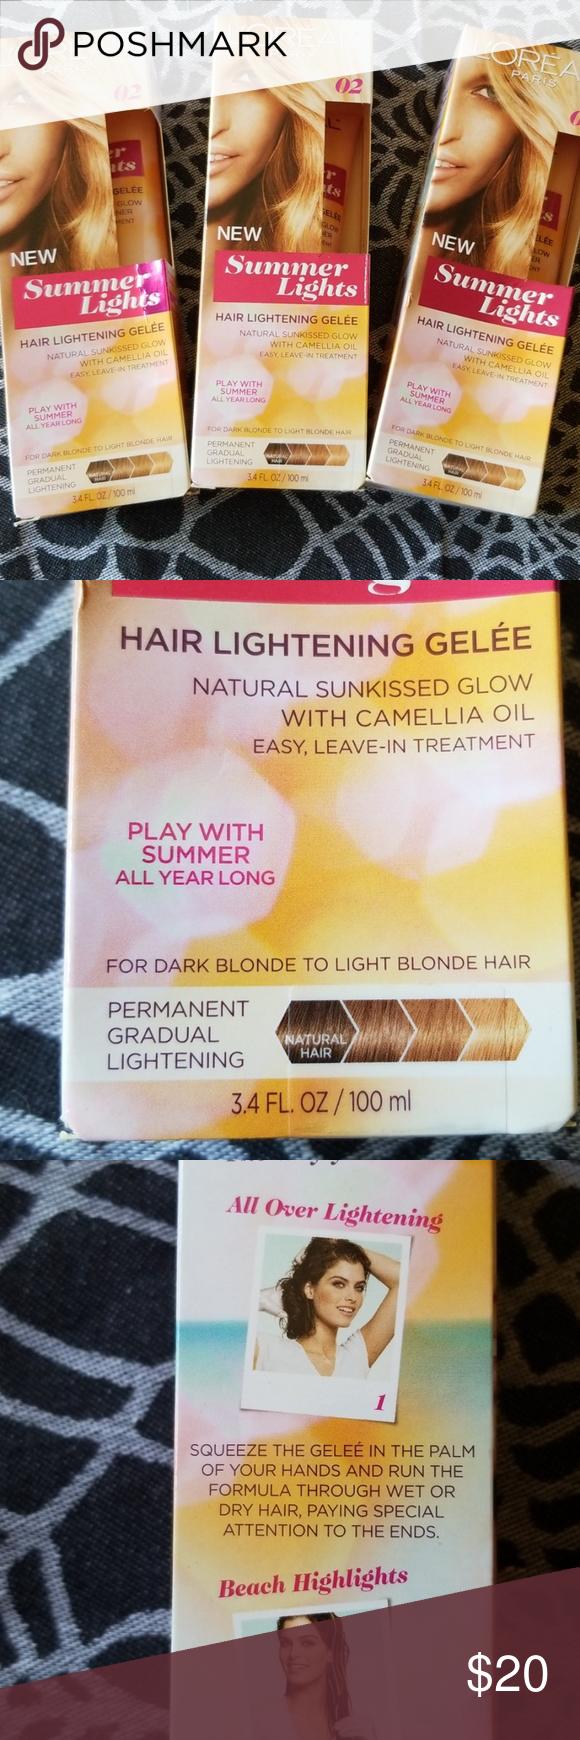 L Oreal Summer Lights Hair Lightwning Gelee L Oreal Summer Lights Hair Lightening Gelee All 3 Boxes New And Sealed Light Hair How To Lighten Hair Light Summer